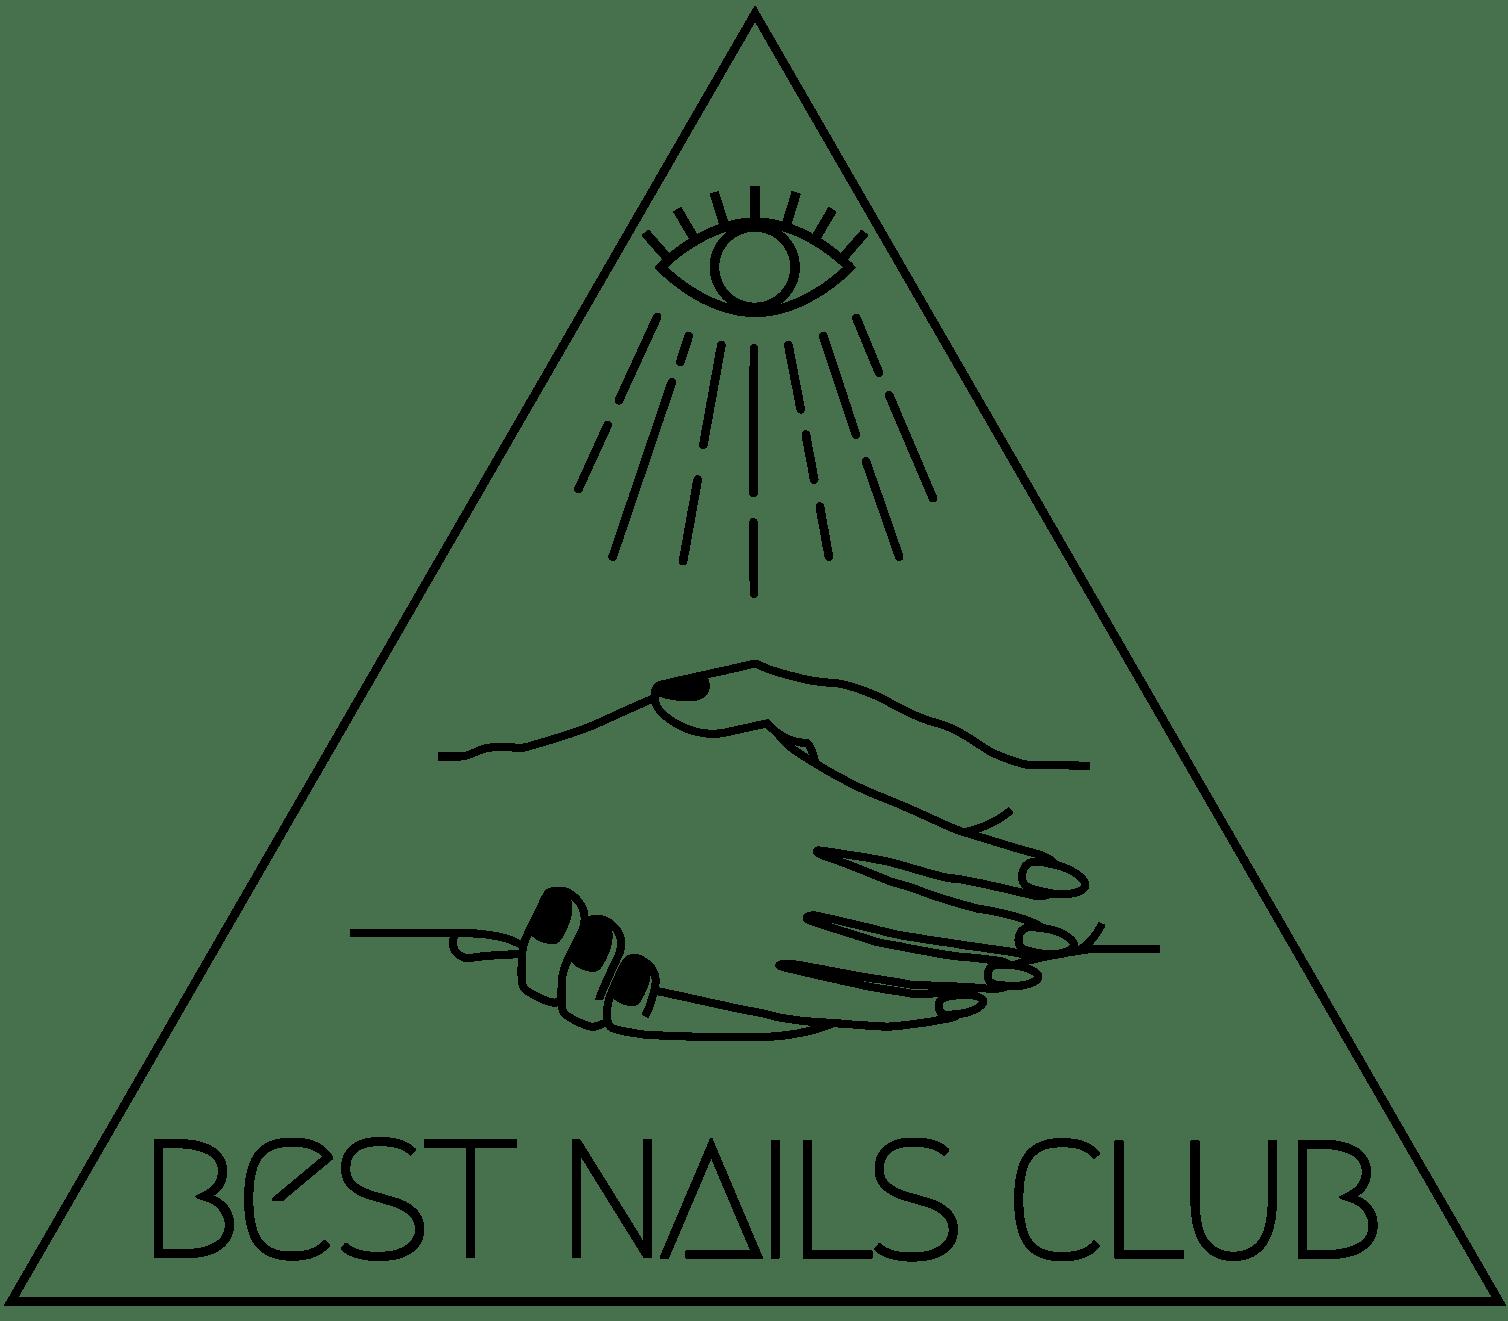 BESTNAILSCLUB